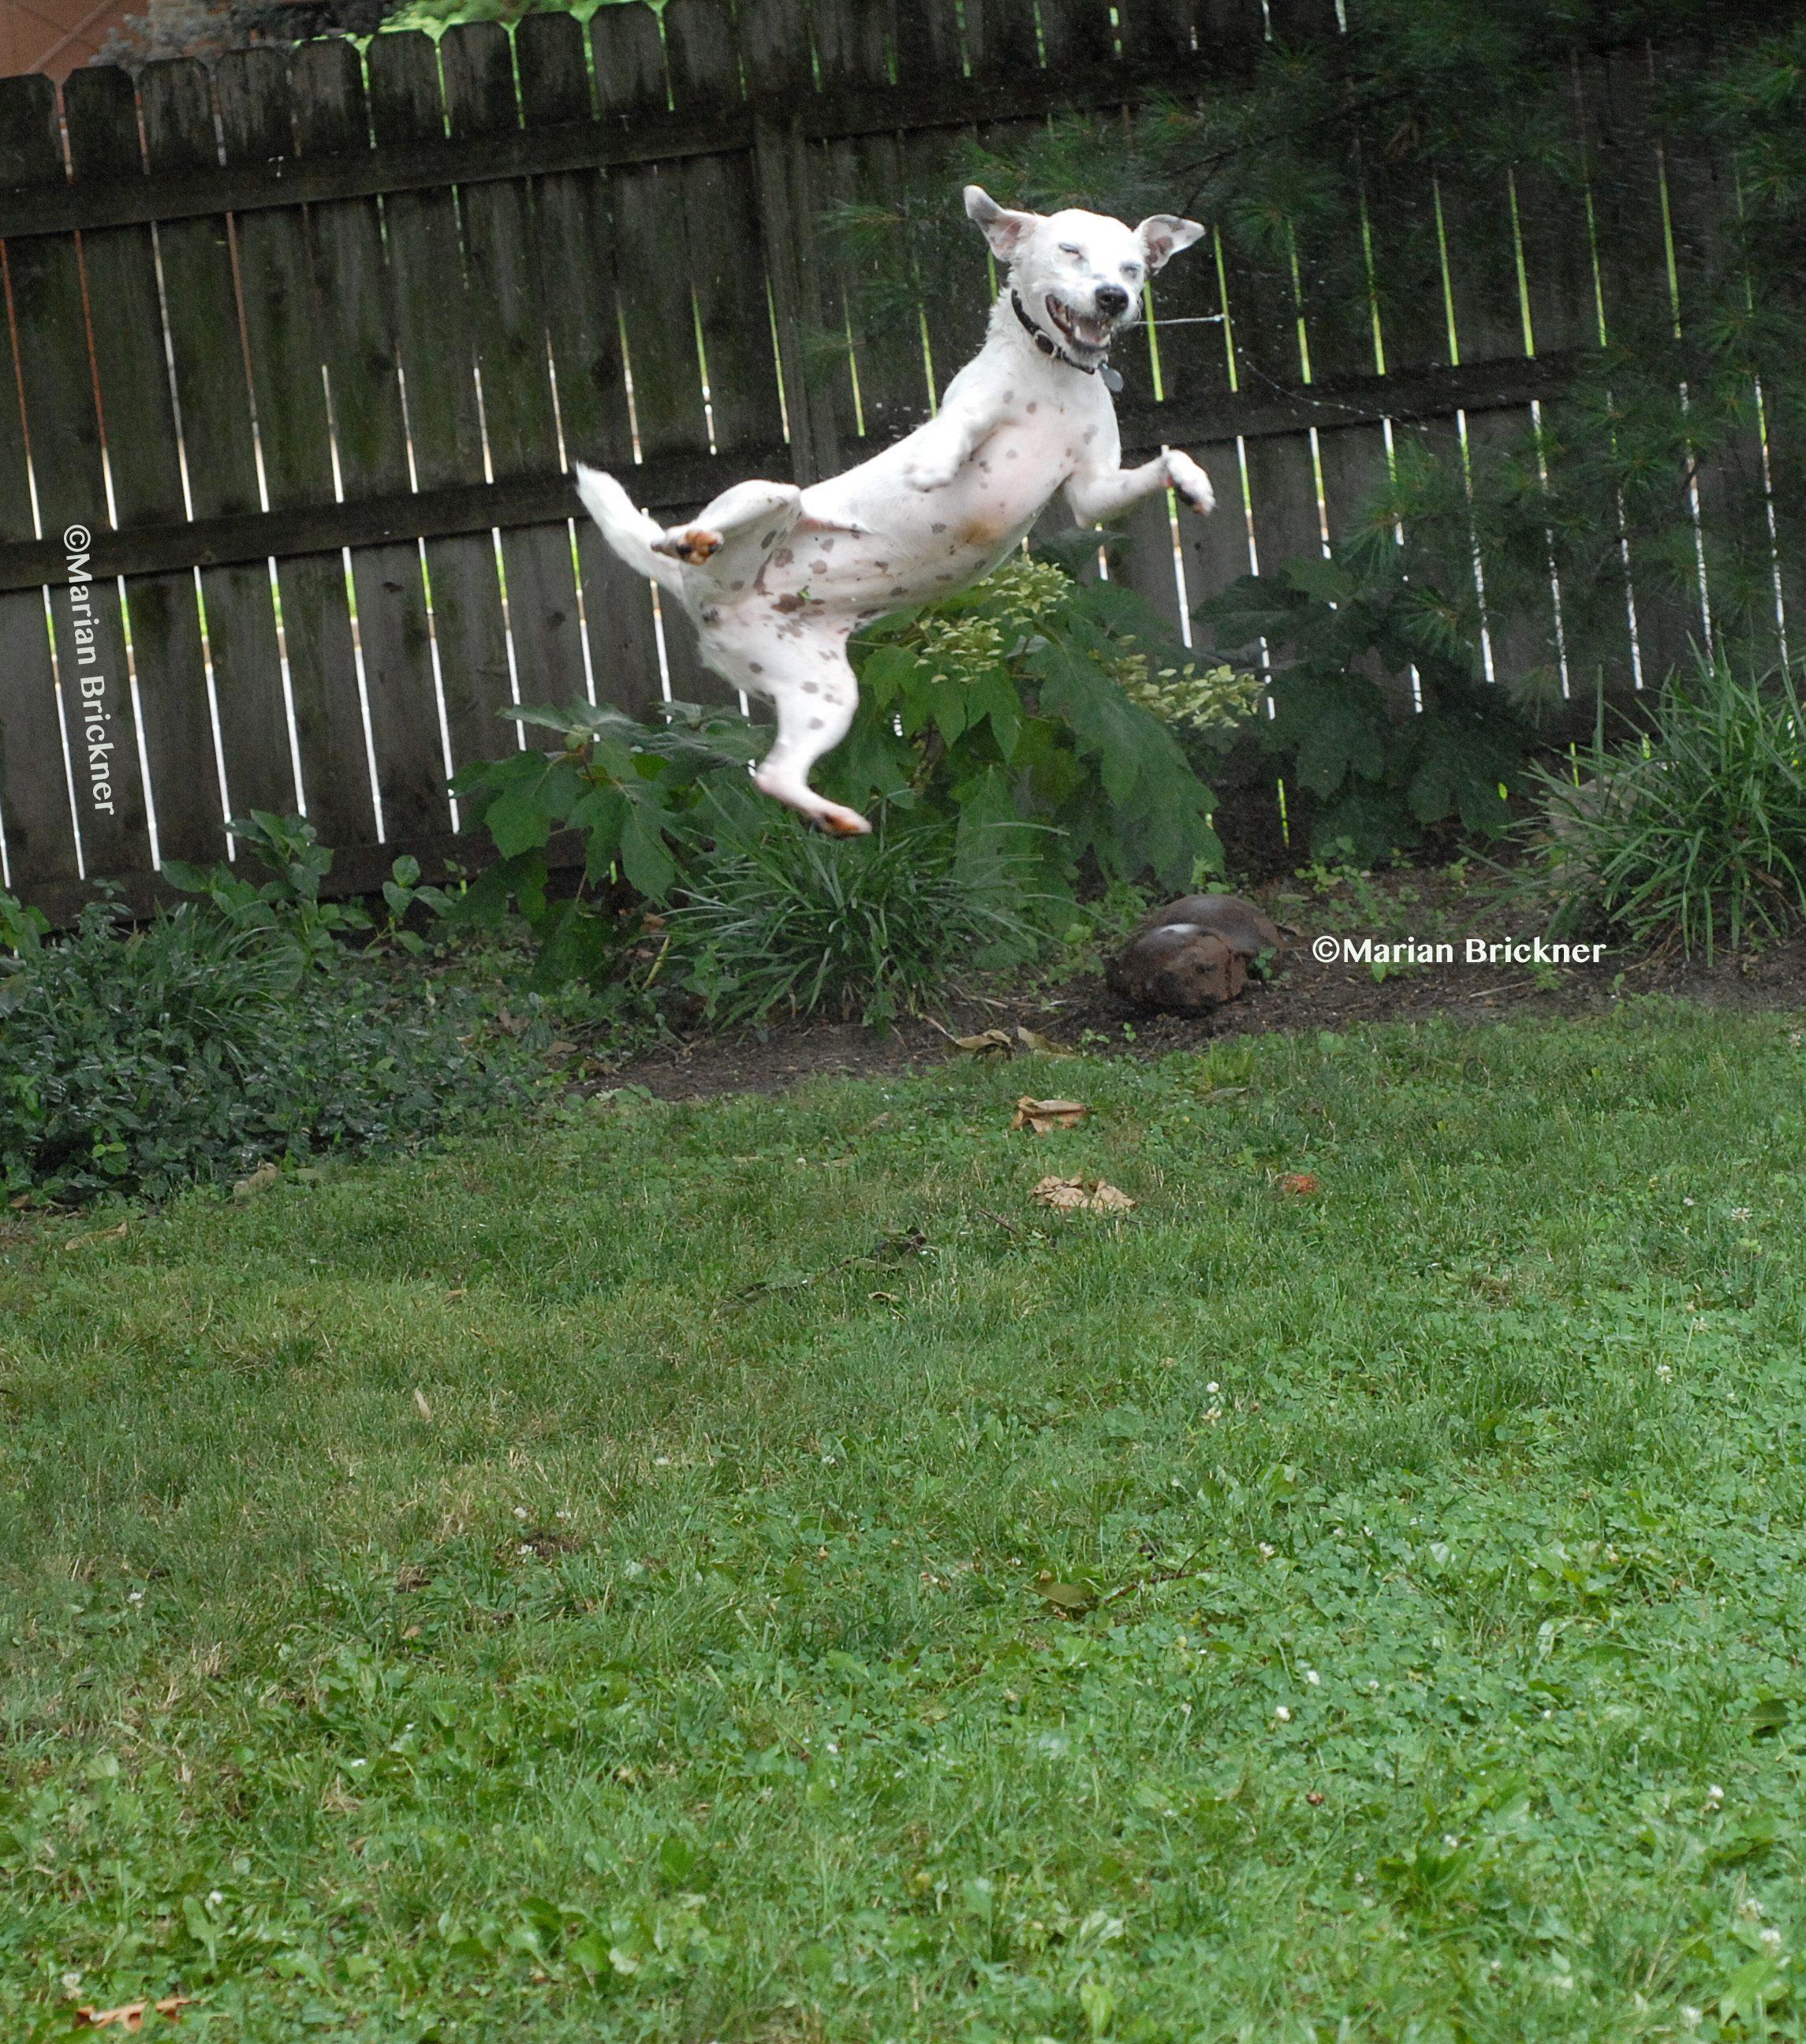 Hopping Hound